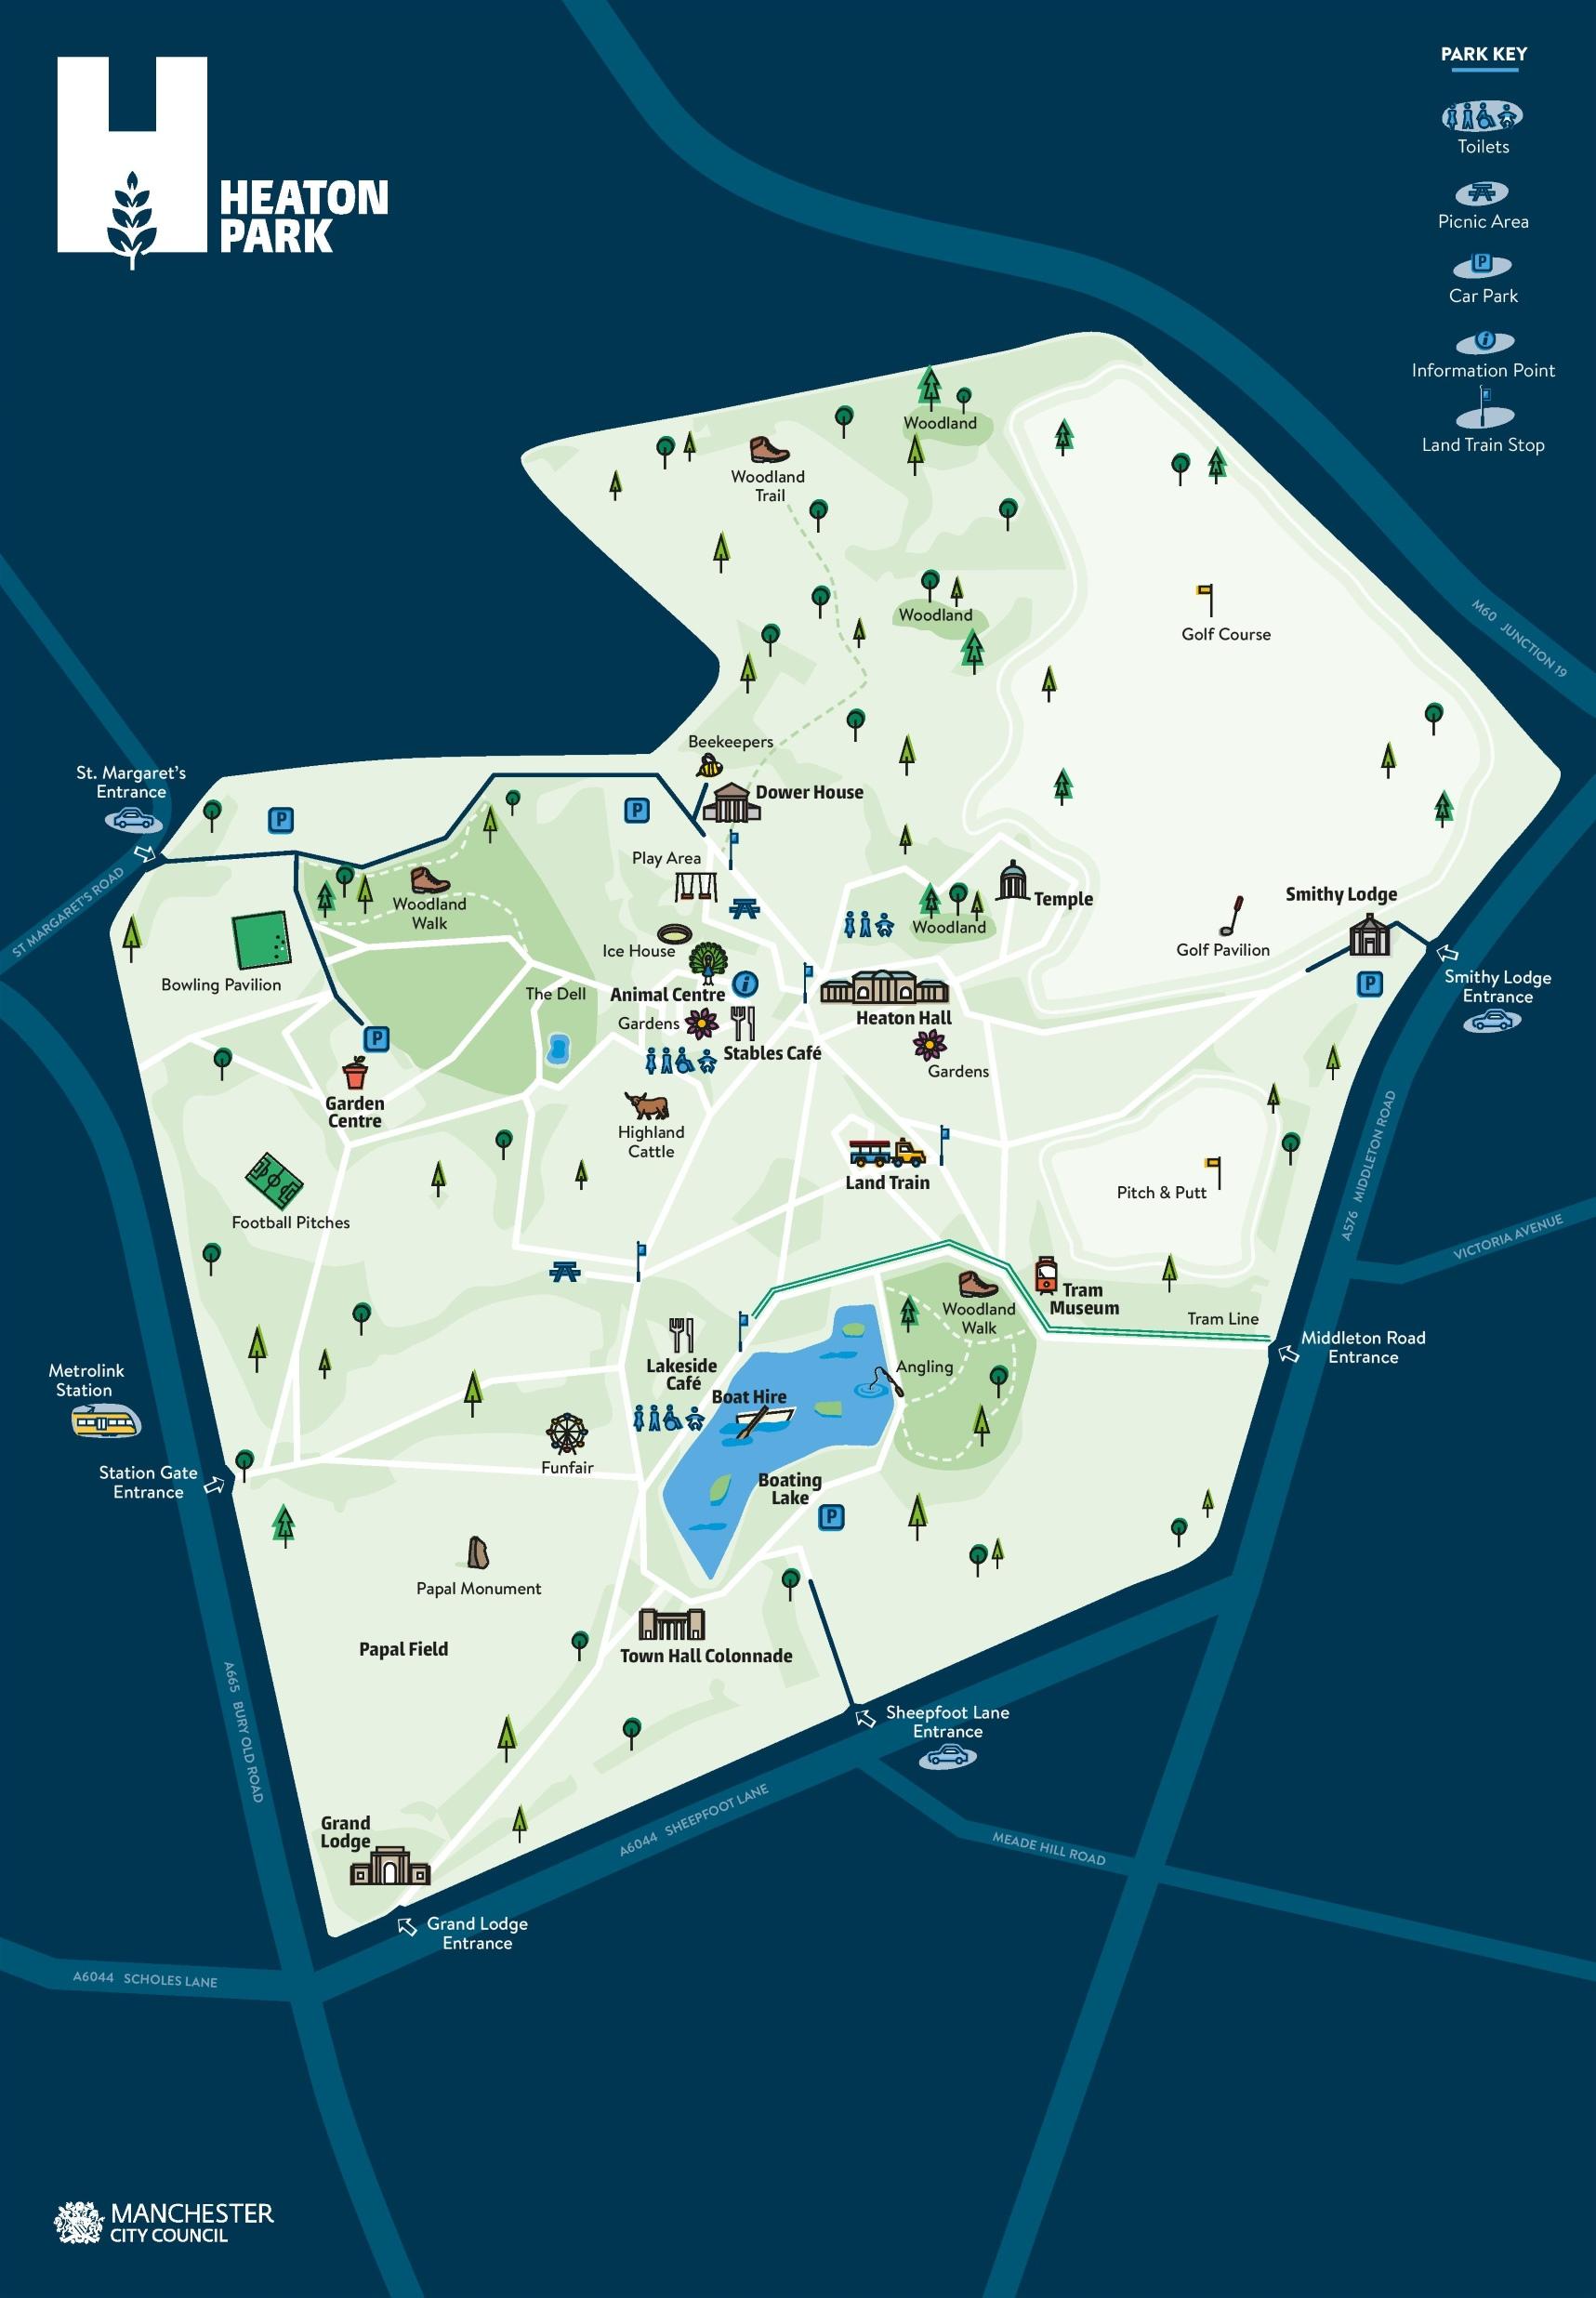 Heaton Park Map